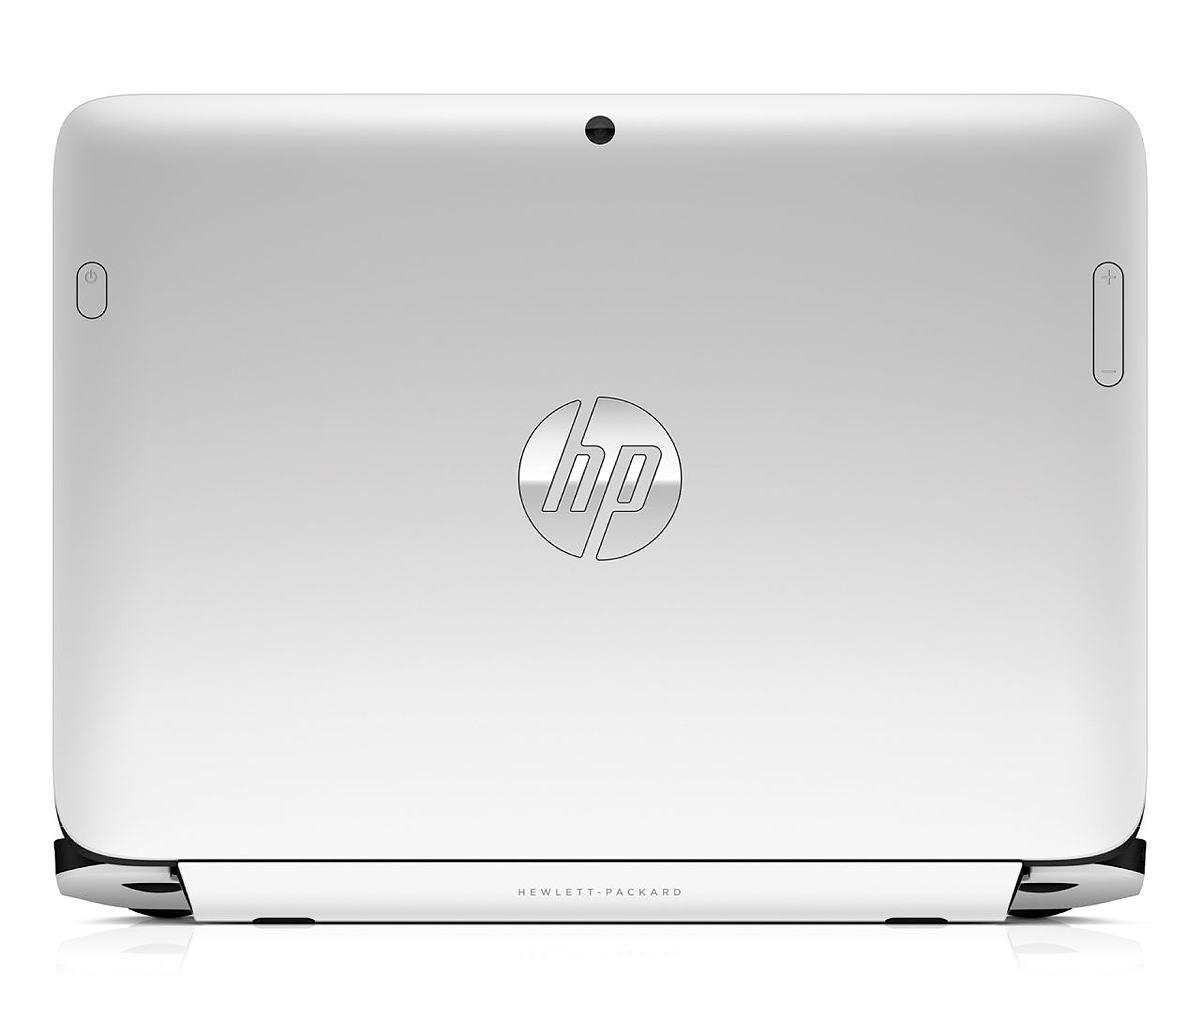 HP-Slatebook-x2-Back